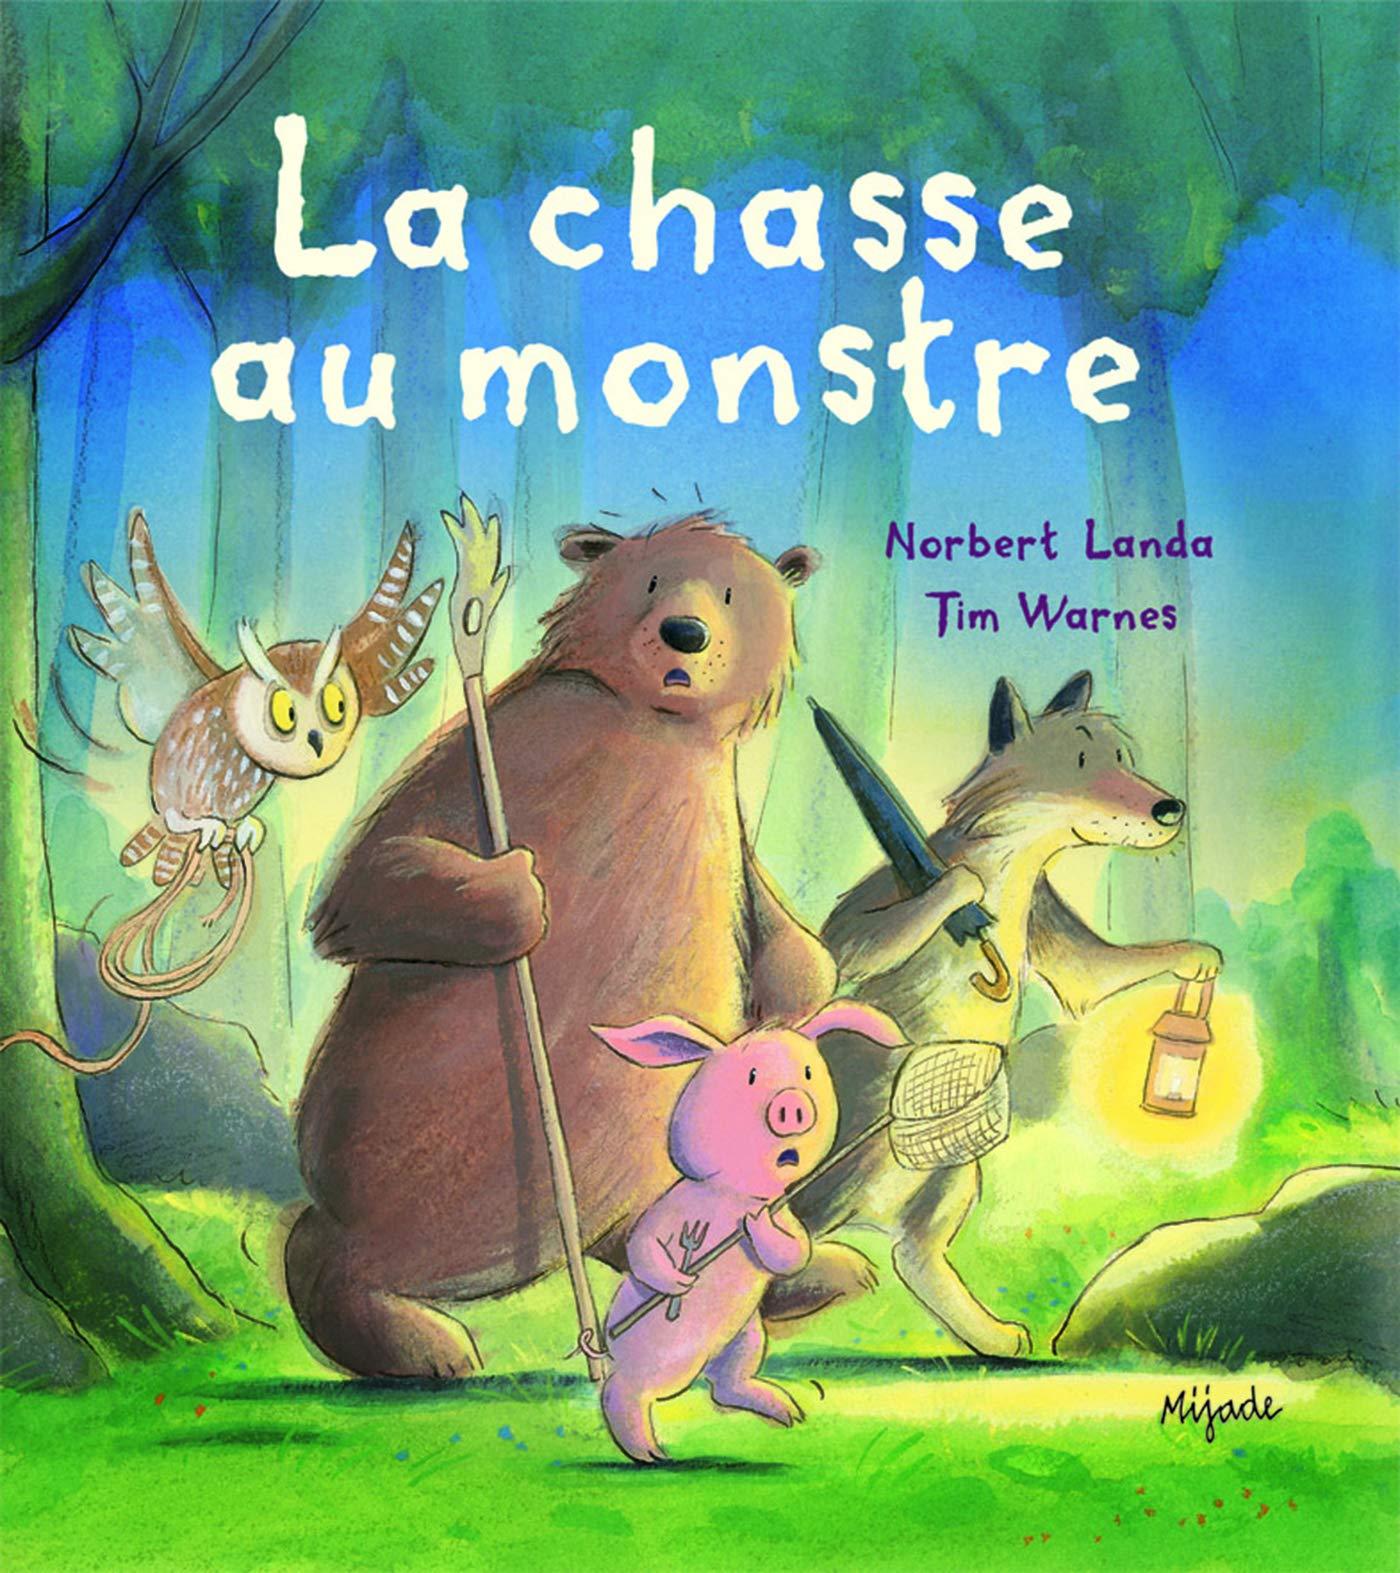 La chasse au monstre: Amazon.ca: Landa, Norbert, Warnes: Books